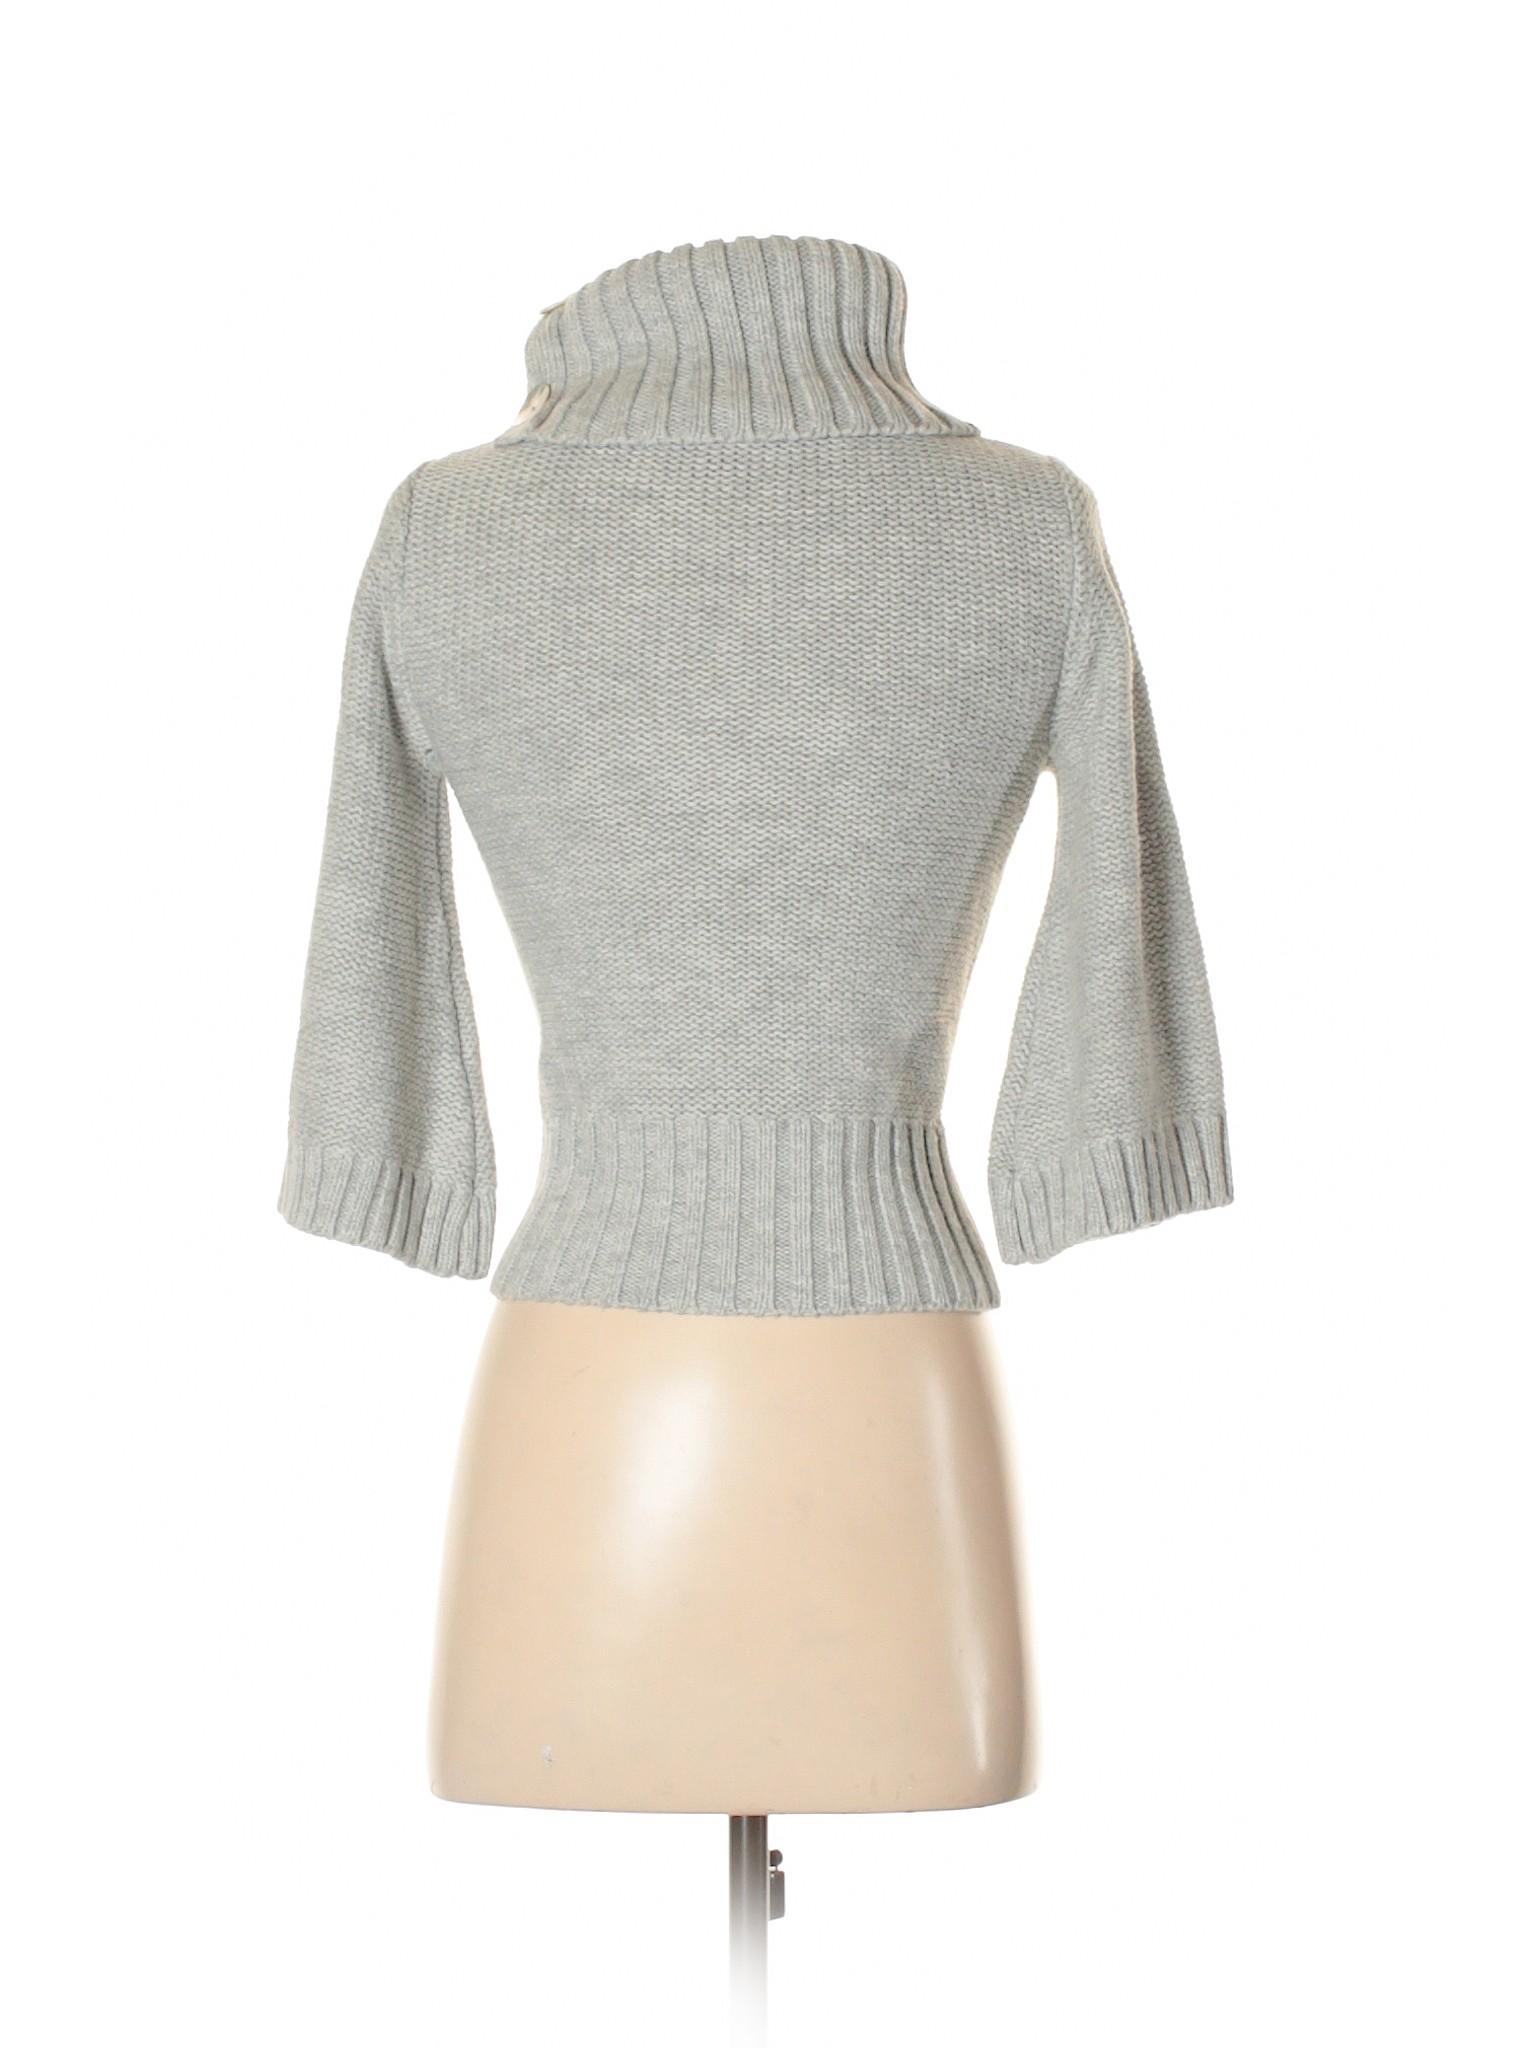 Liv Sweater Liv Boutique Boutique Liv Boutique Pullover Pullover Sweater Pullover qwAg76w